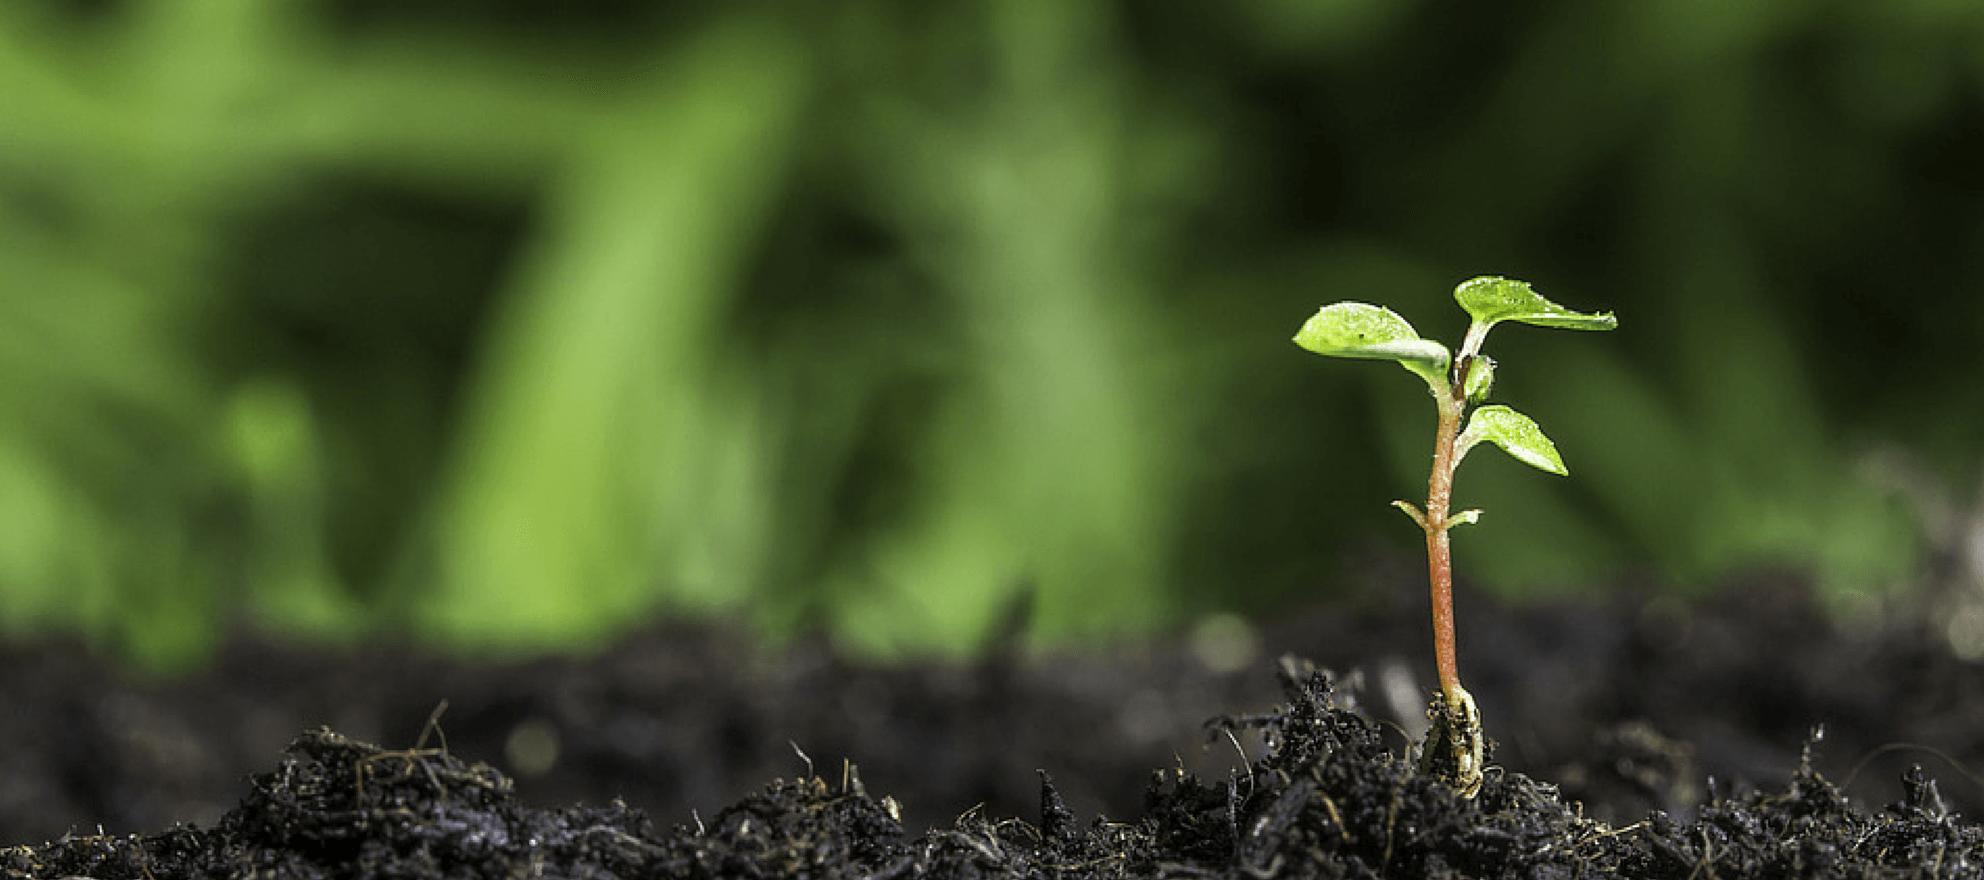 National broker portal initiative raising seed money